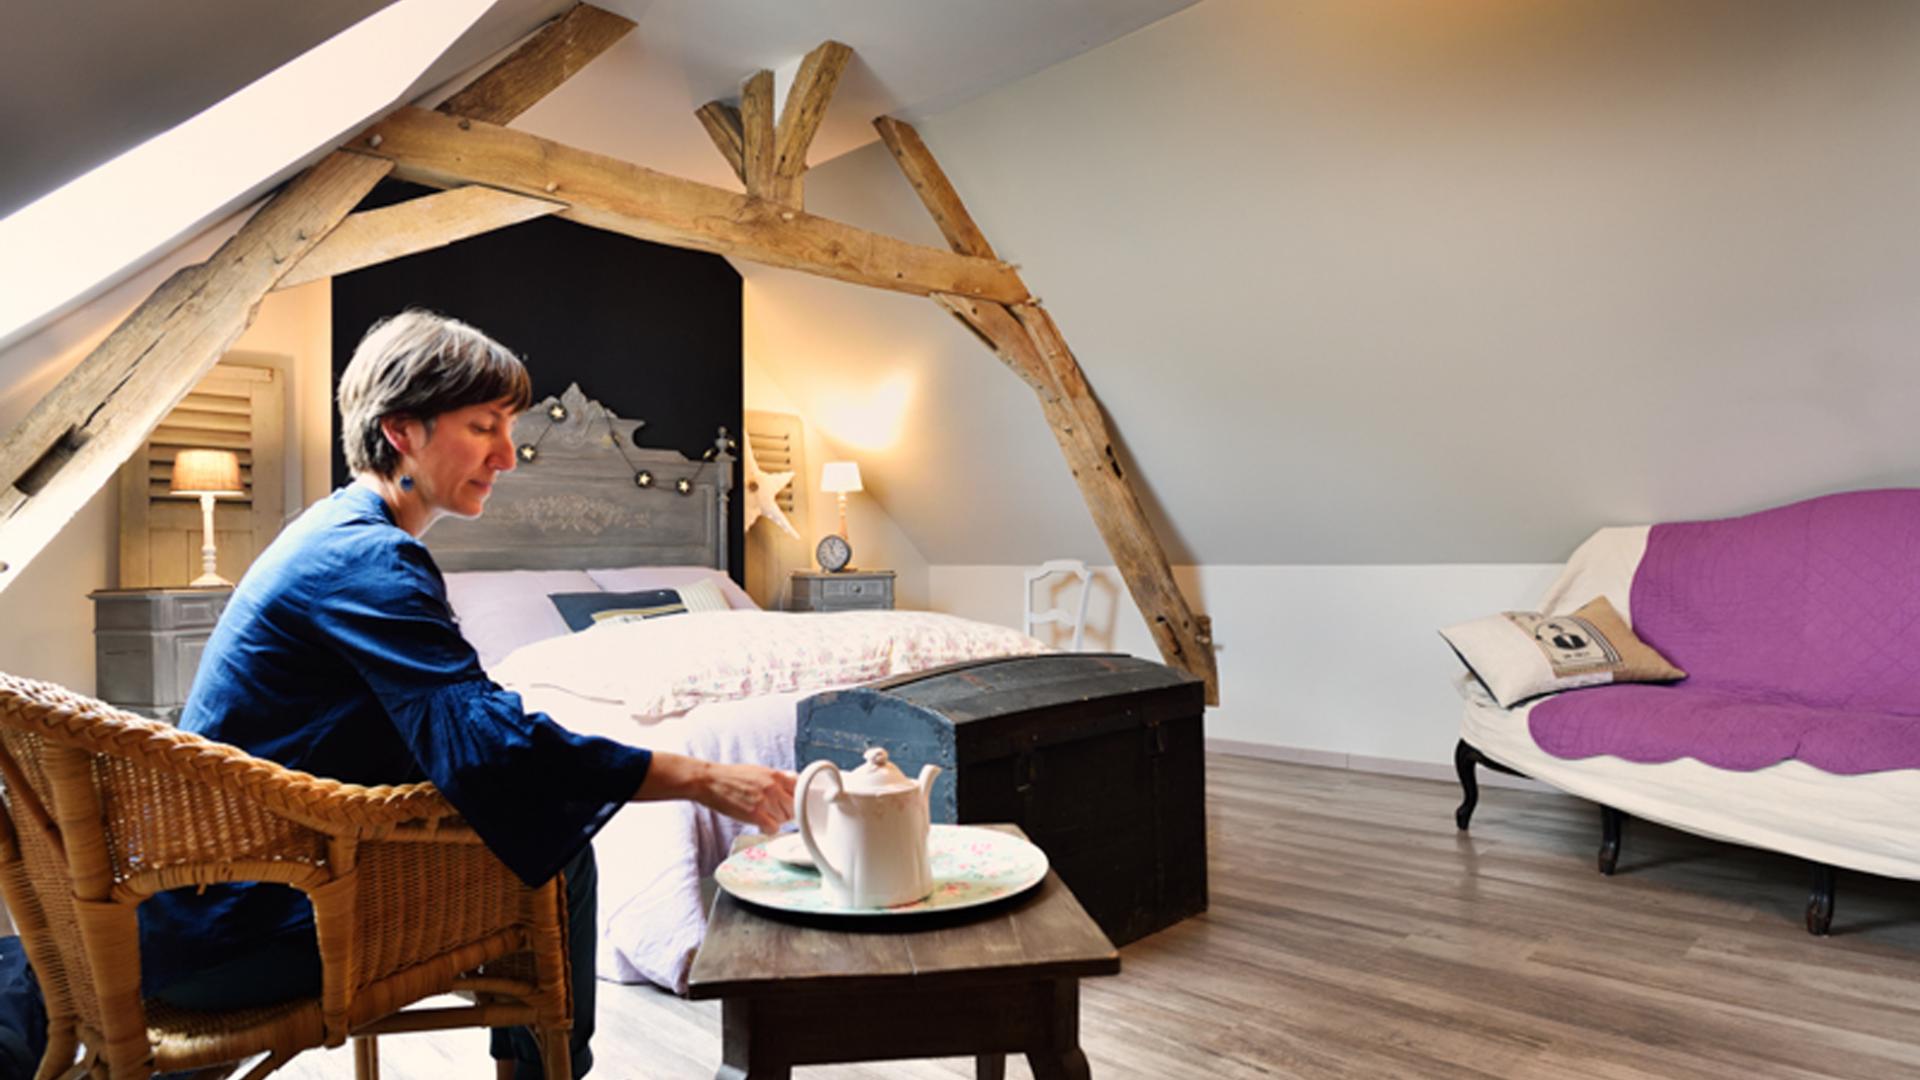 Où dormir en Vallée de la Sarthe- Atelier and Cow à Louplande